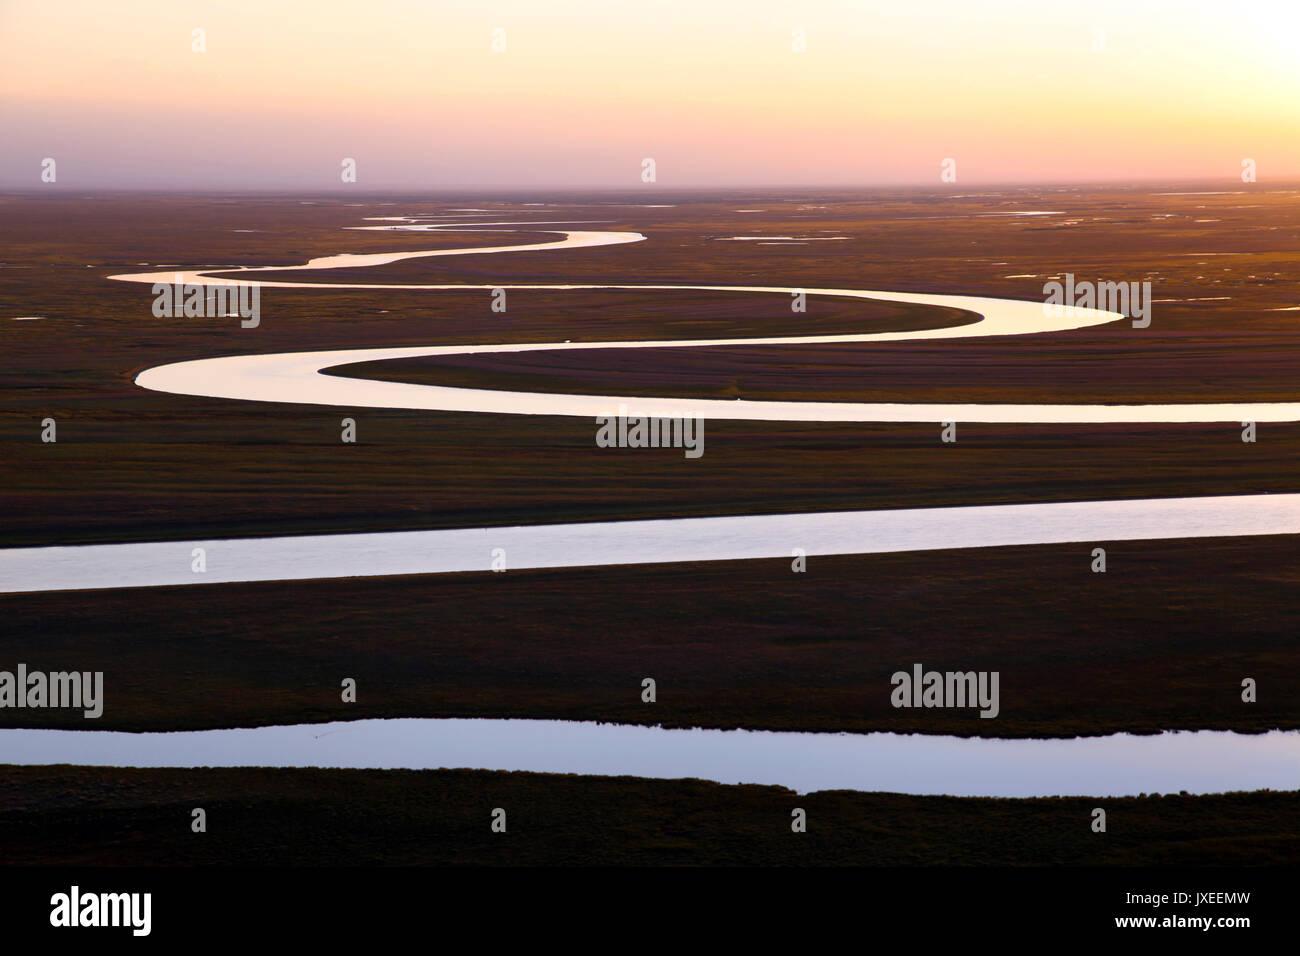 Xinjiang, China. 15th Aug, 2017. Xinjiang, Winding river across the Bayinbuluke Alpine Grassland in northwest China's - Stock Image